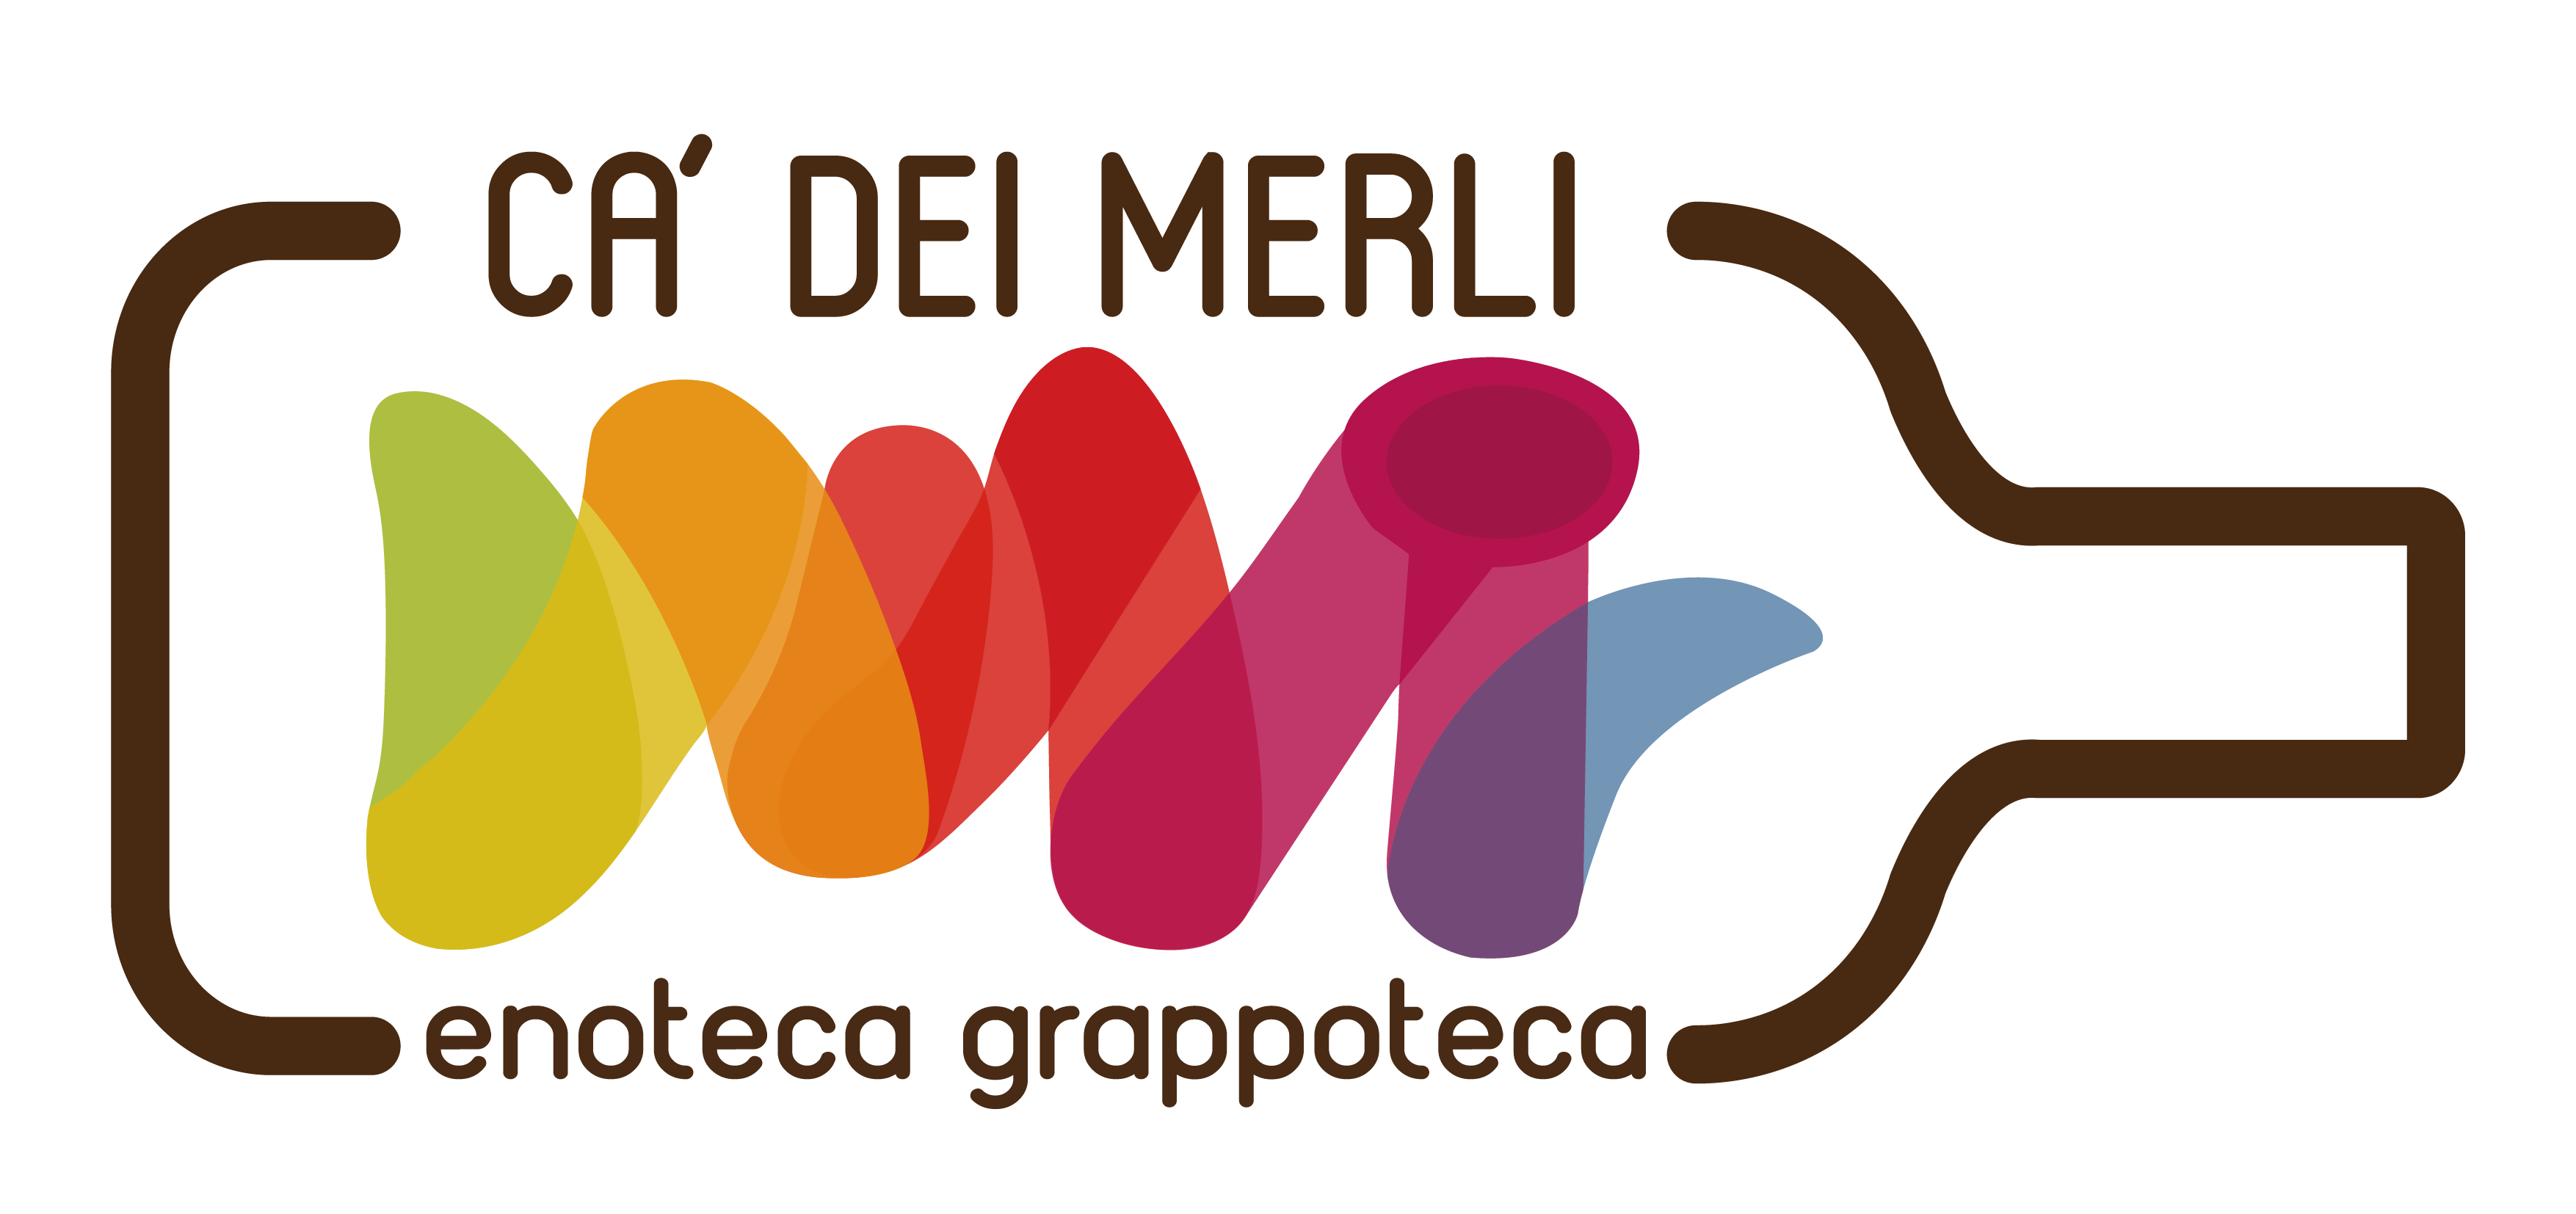 Enoteca Trentino